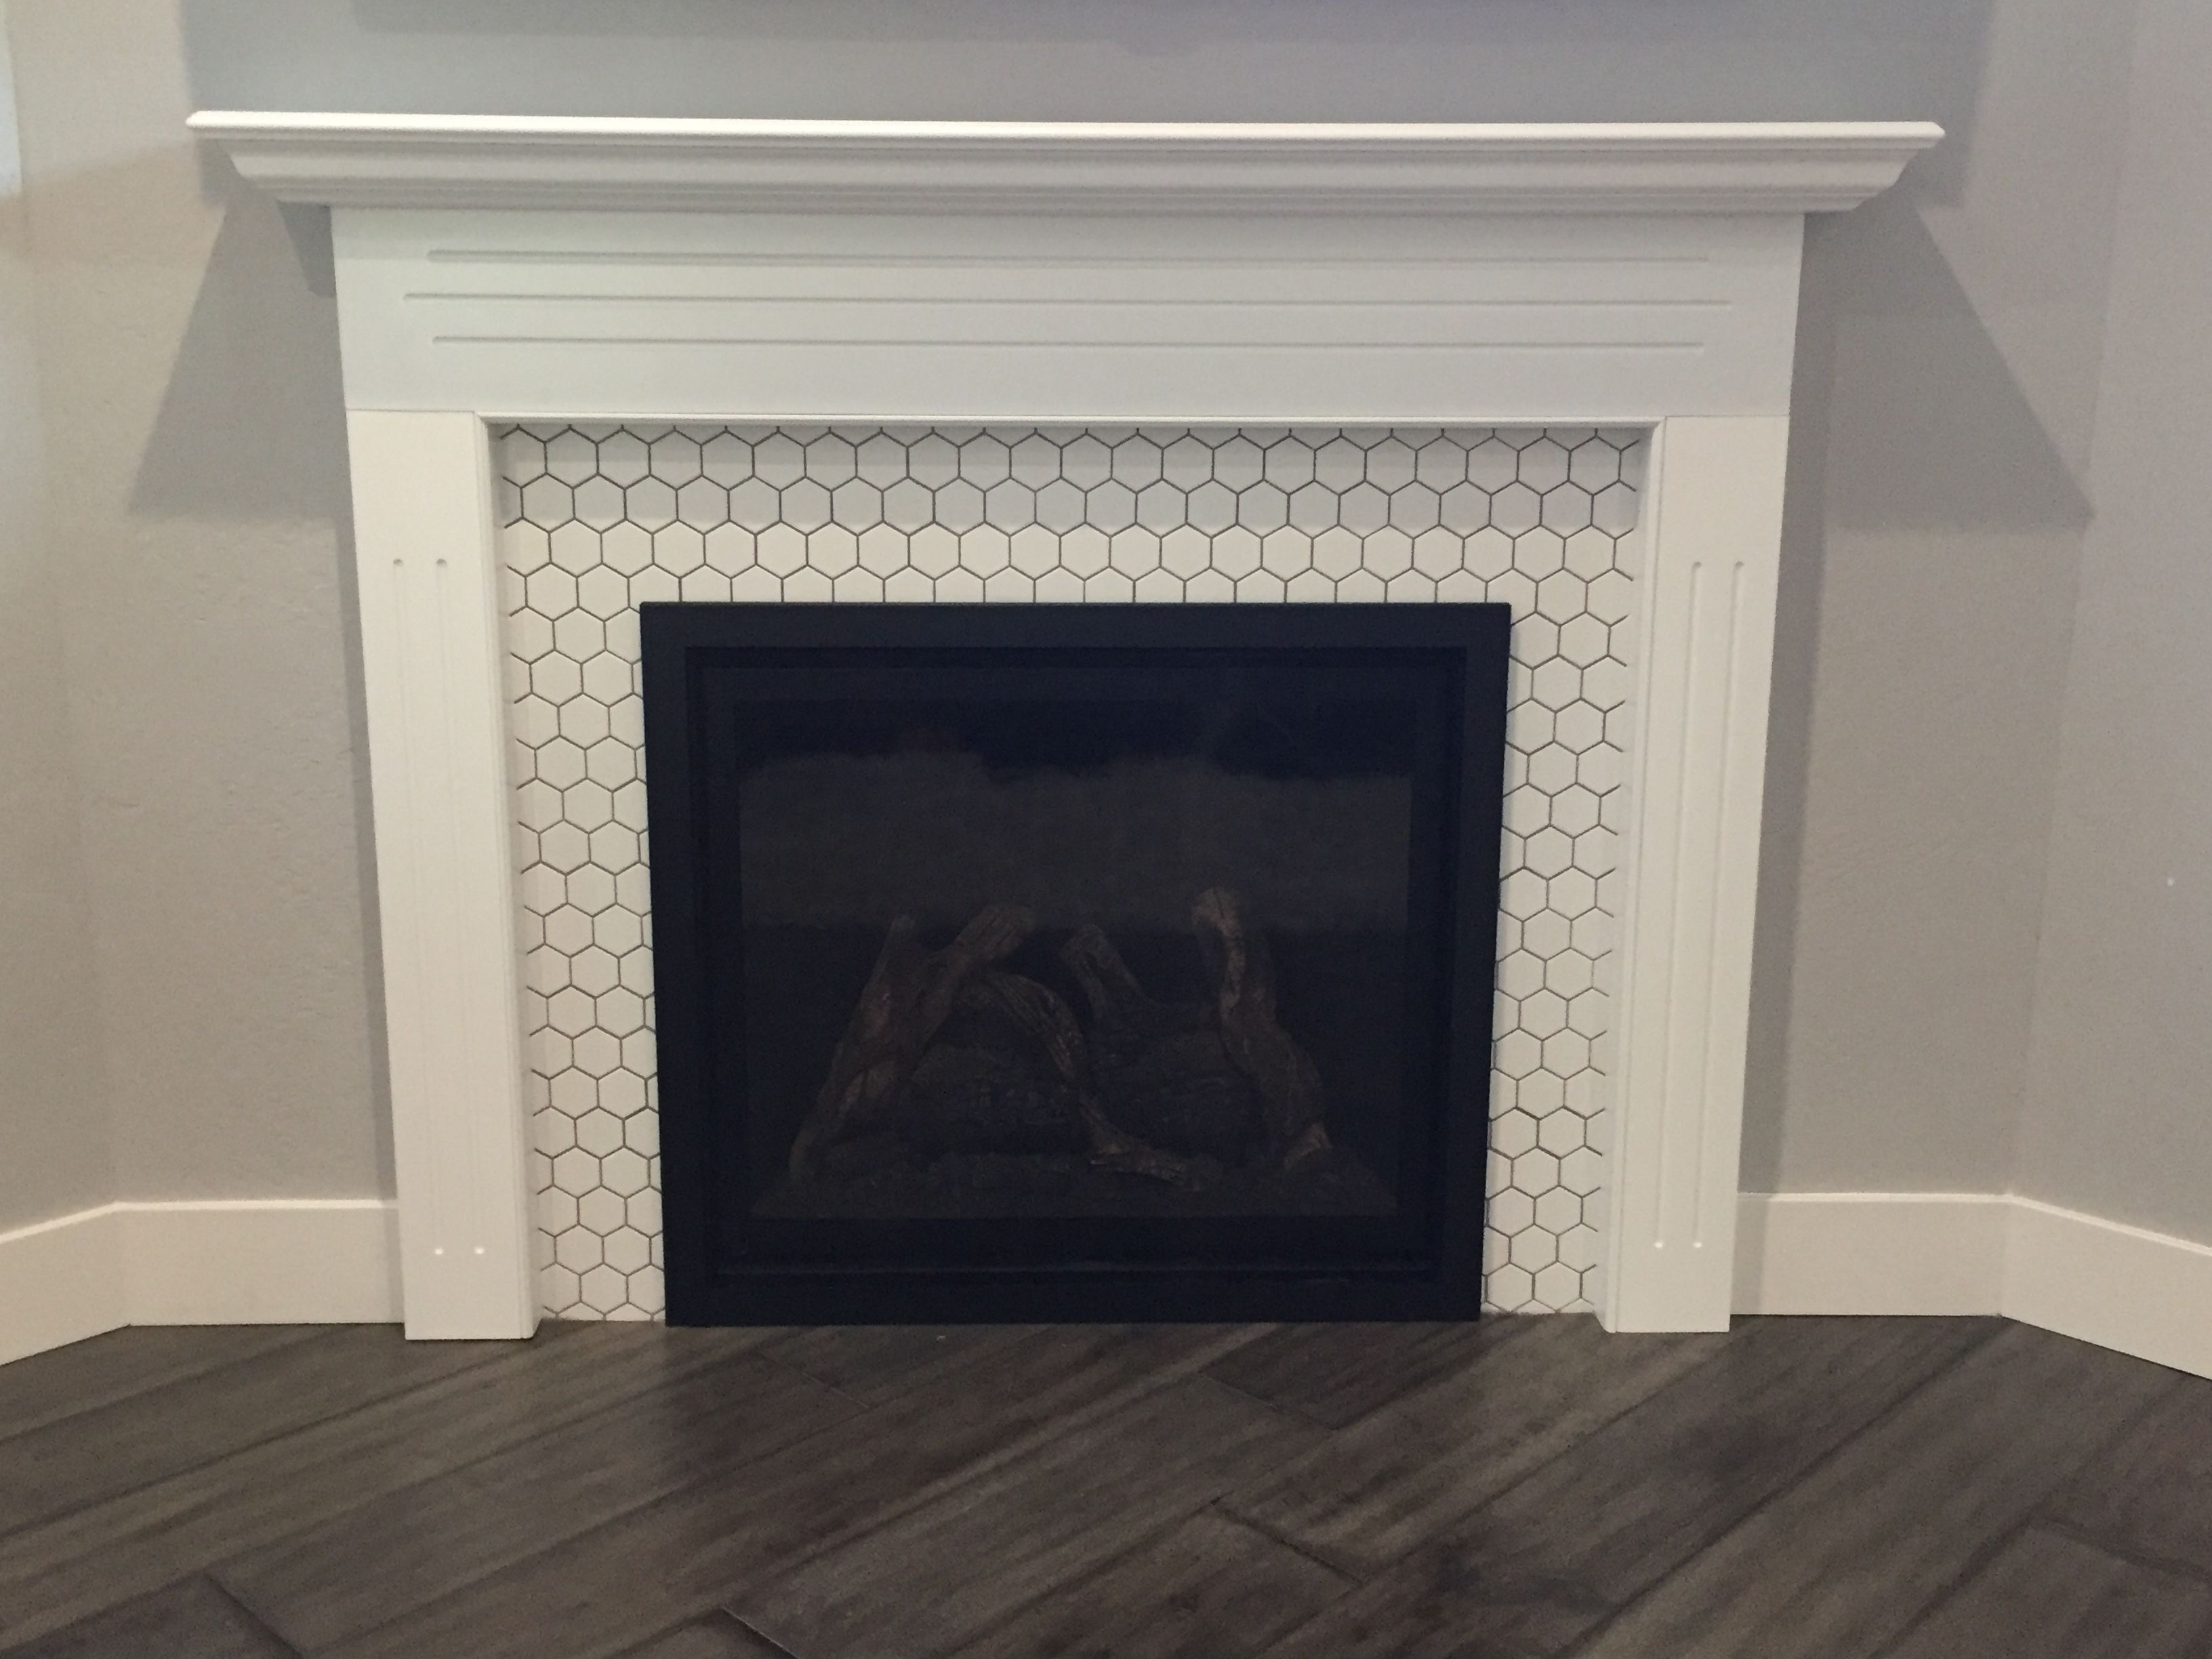 Tile Fireplace Honeycomb Design Fireplace Tile Tile Around